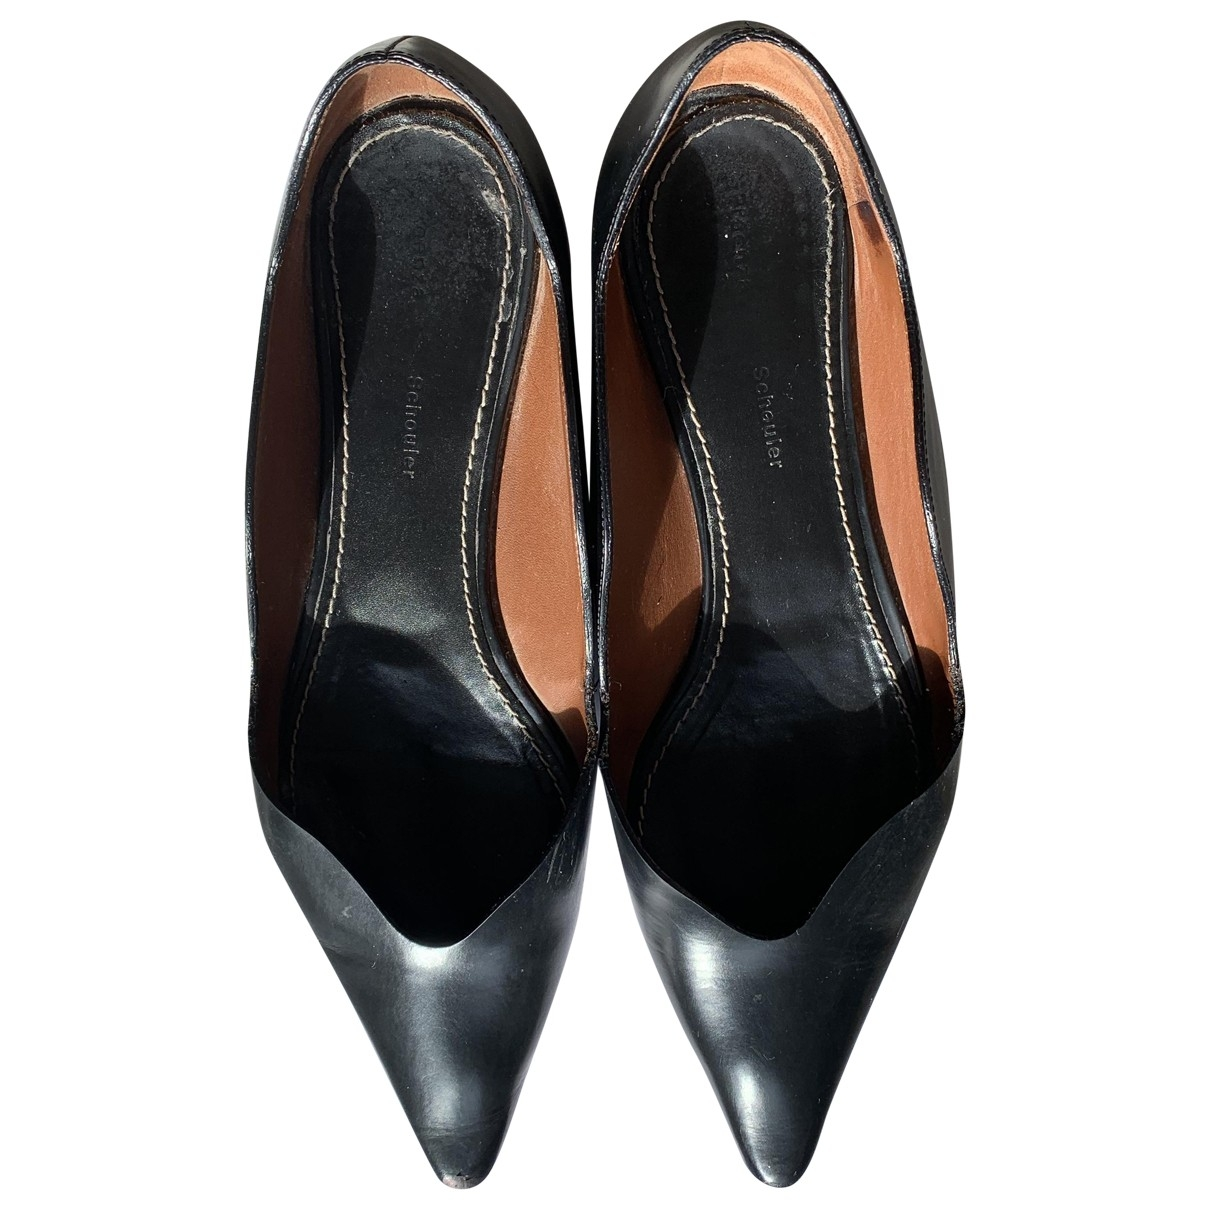 Proenza Schouler - Ballerines   pour femme en cuir - noir